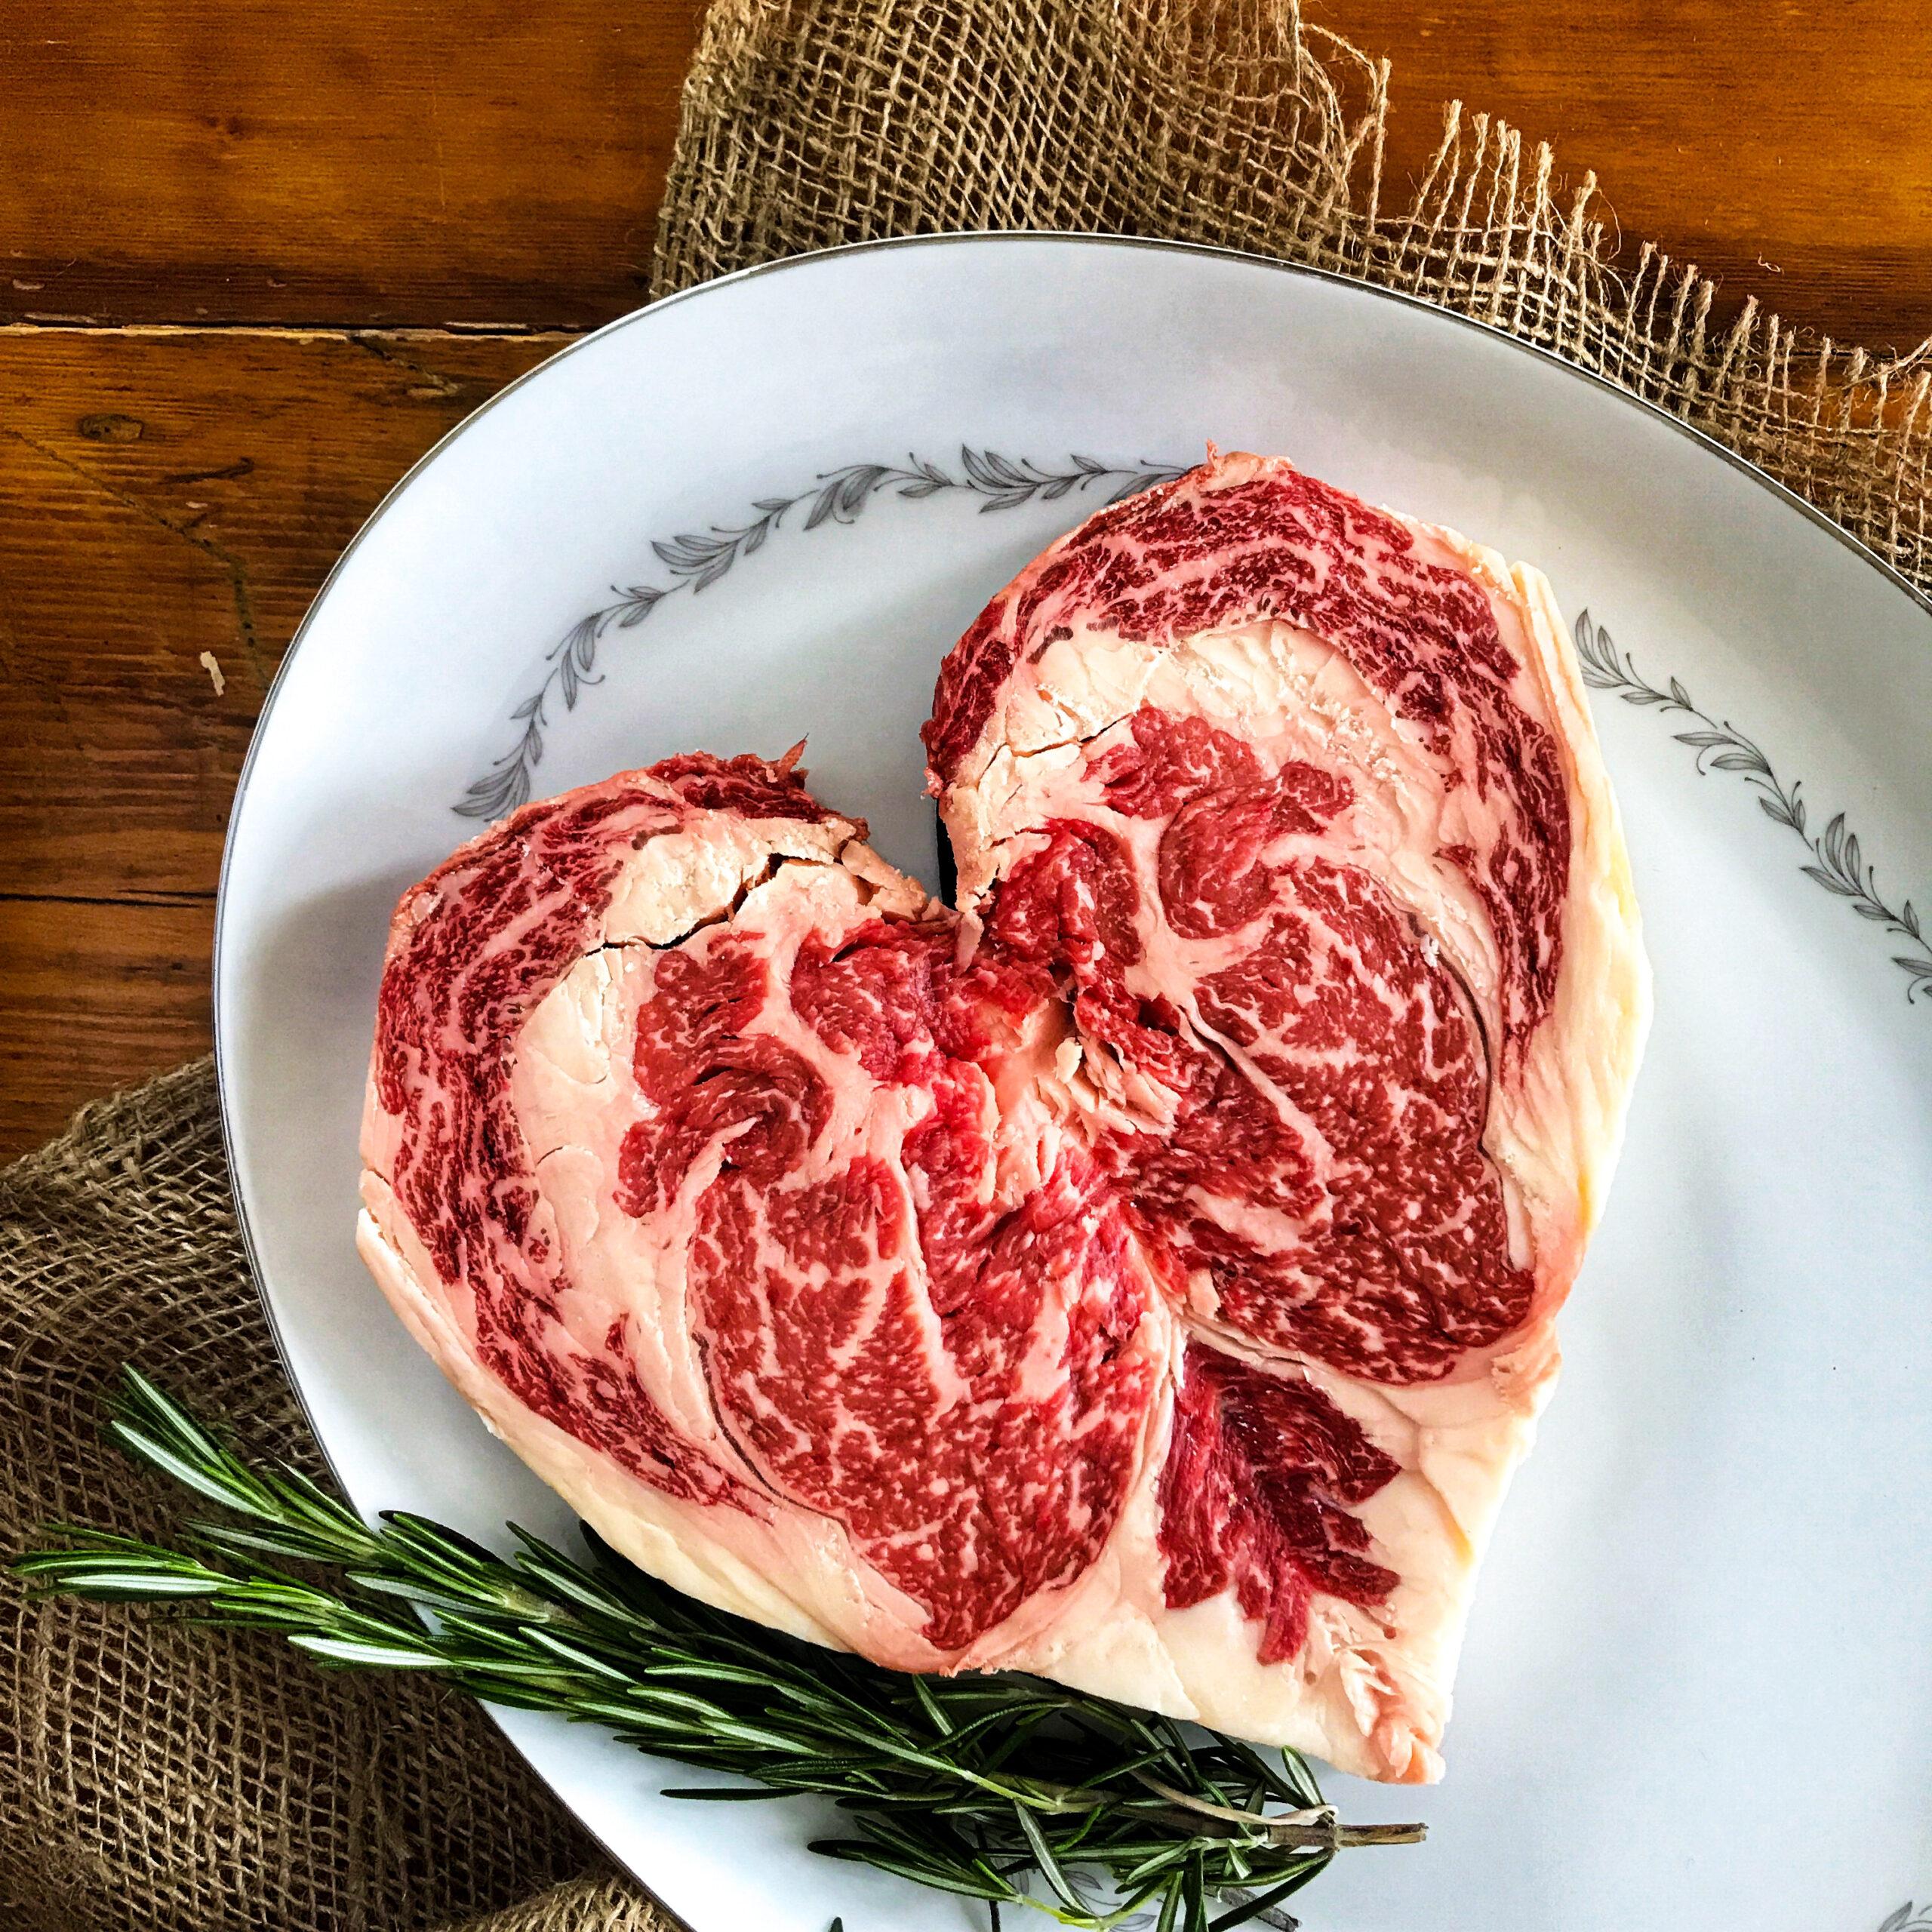 Valentine's Day Heart-Shaped Ribeye Steak